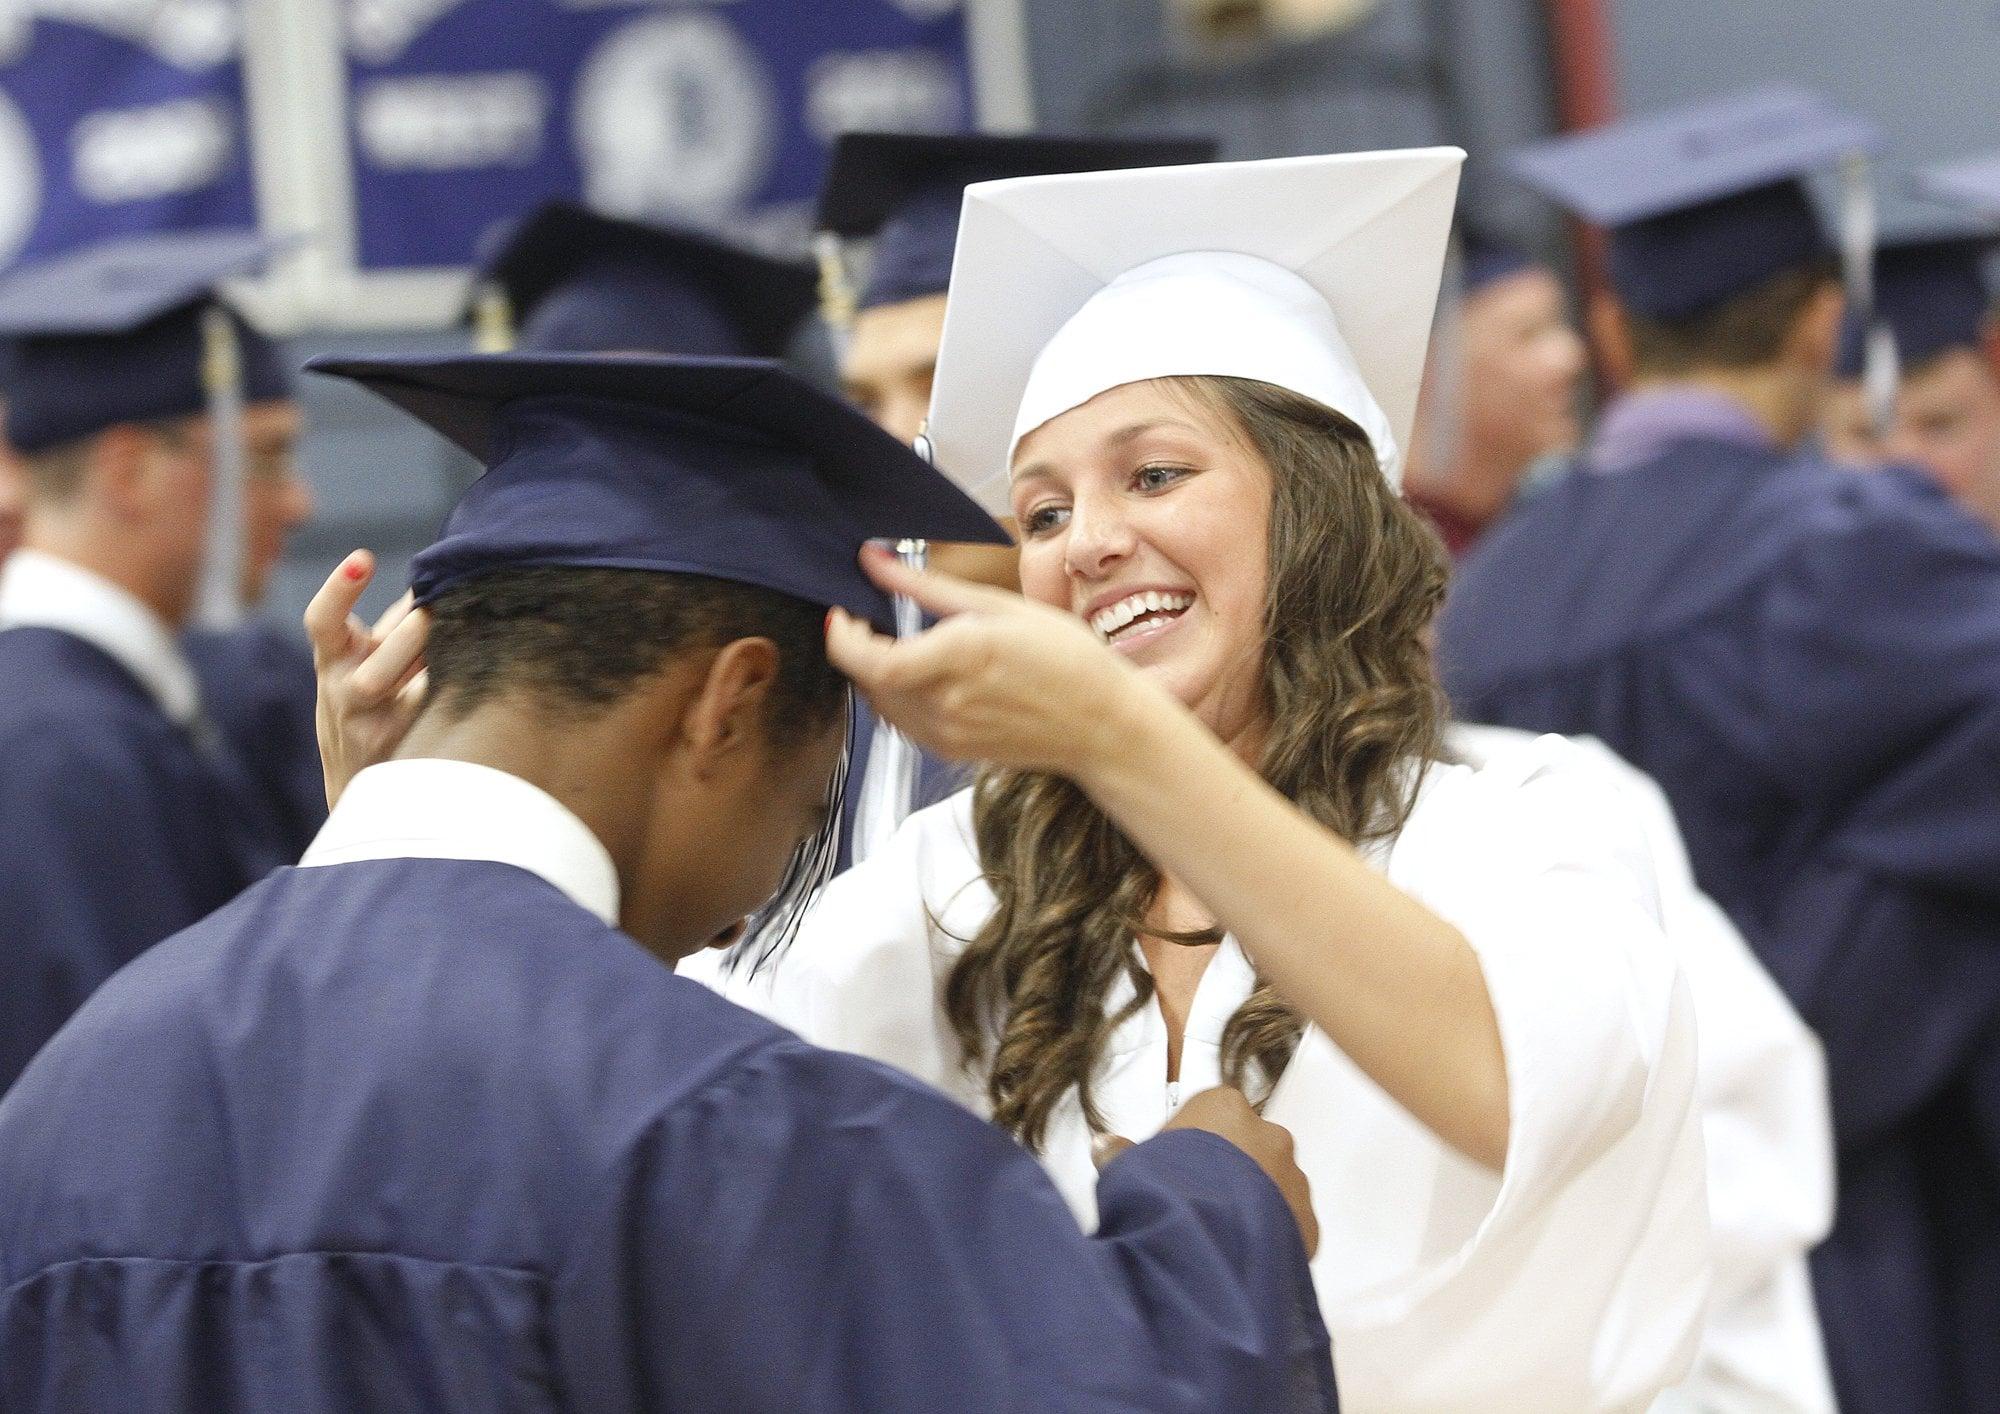 Westbrook High School Graduation. Kaelyn Galipeau helps classmate Jeremiah Steele with his cap before the start of graduation ceremonies. Photographed on Friday, June 8, 2012.  (Photo by Derek Davis/Portland Press Herald via Getty Images)